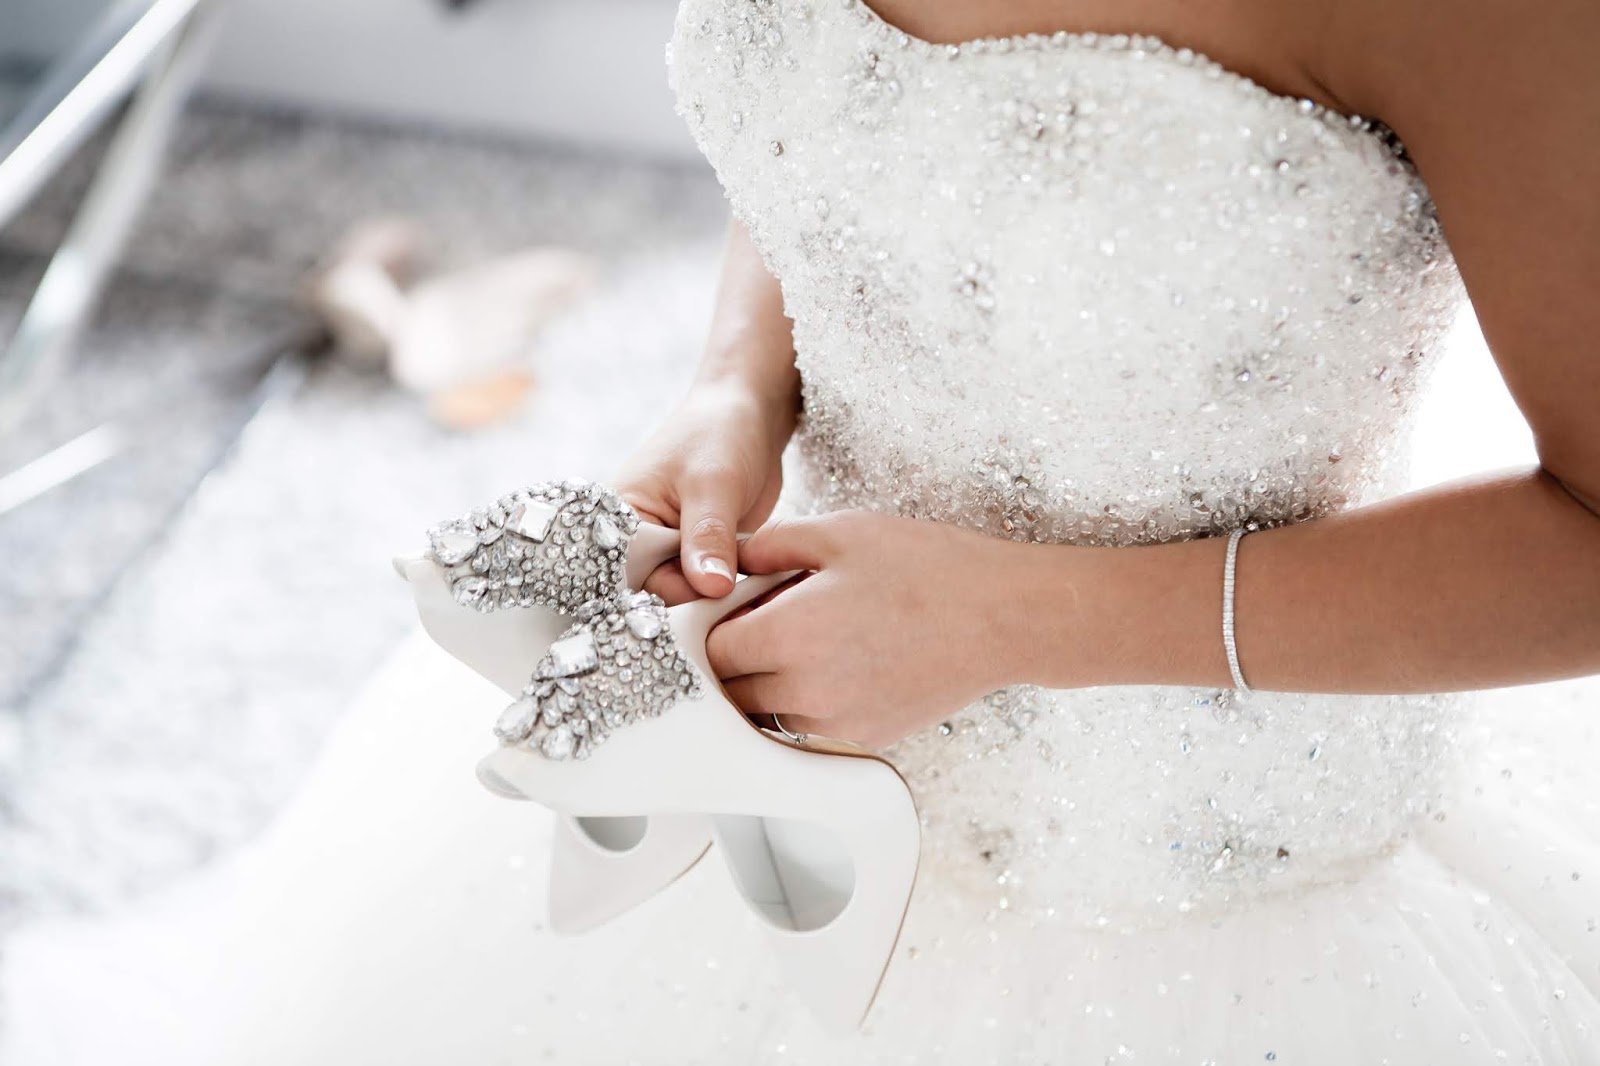 So you're going wedding dress shopping, 8 tips before you go wedding dress shopping for the first time